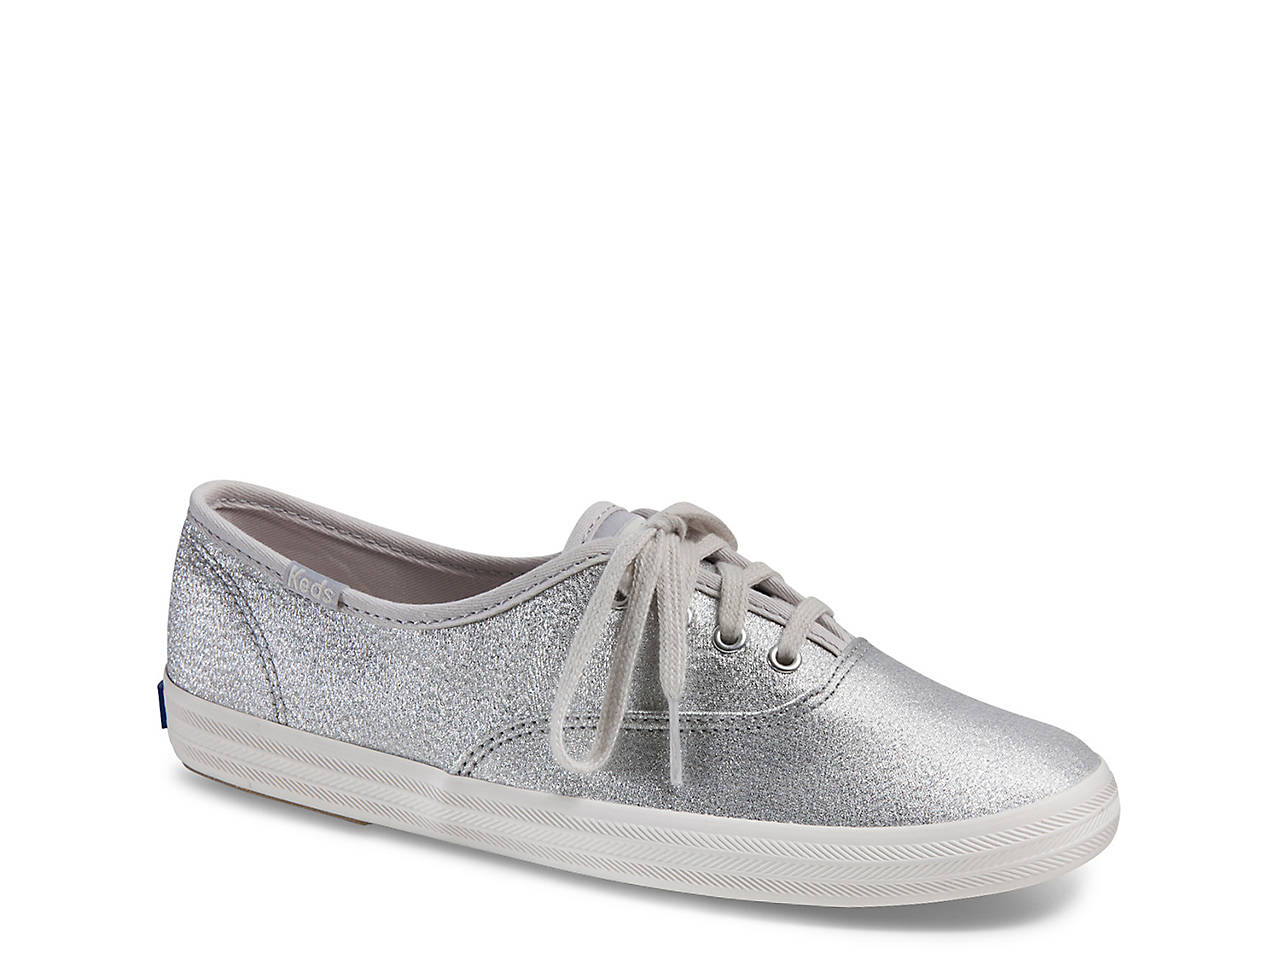 8e7ecea7e46b0 Keds Champion Lurex Sneaker - Women s Women s Shoes